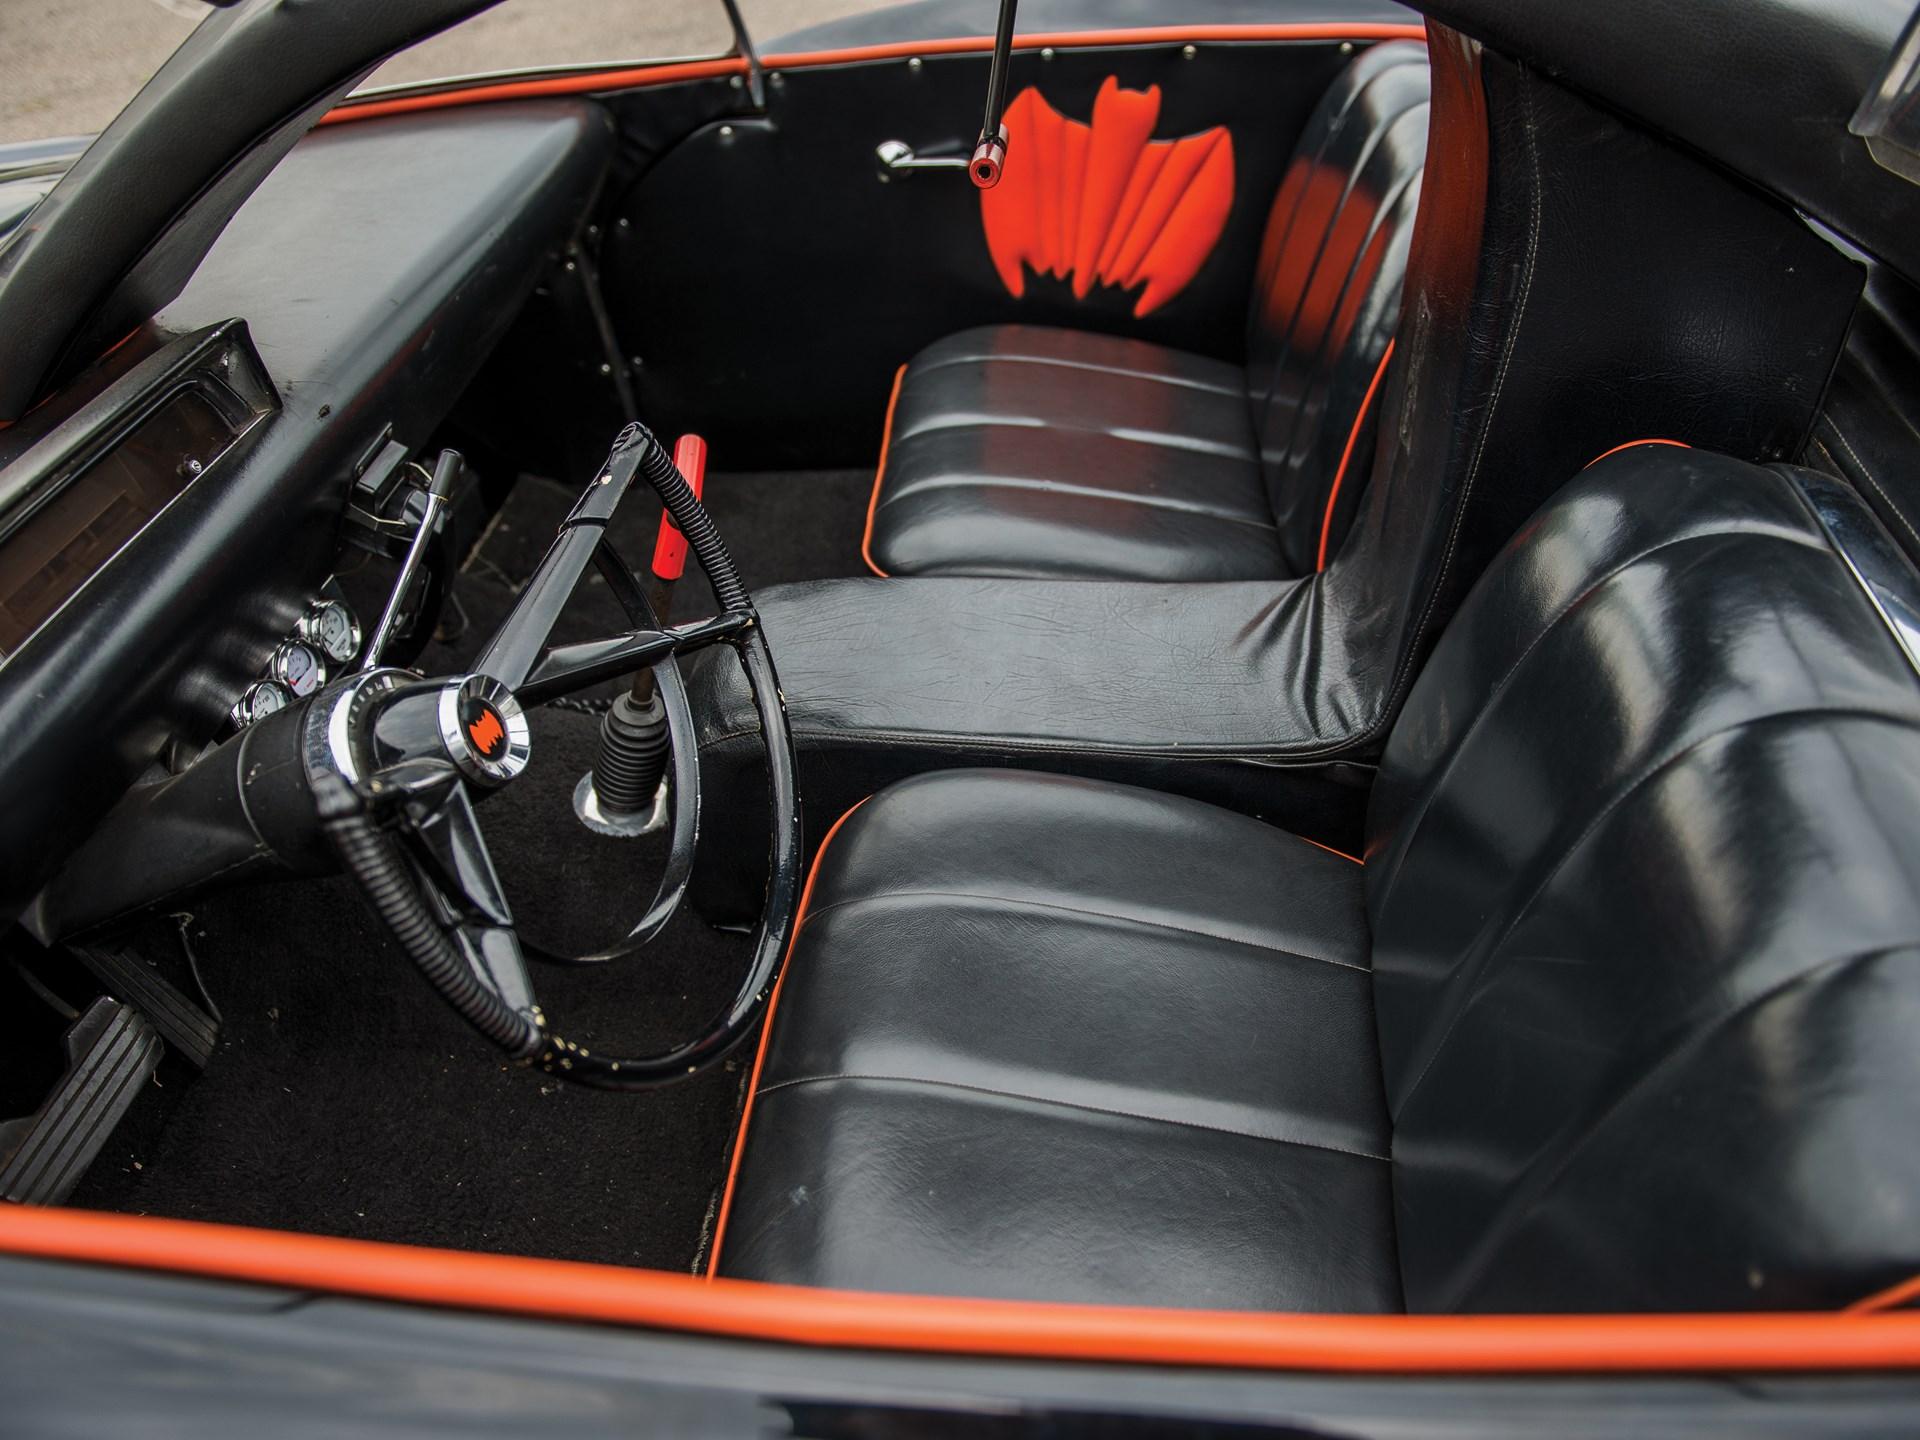 1966 Batmobile Recreation interior seats